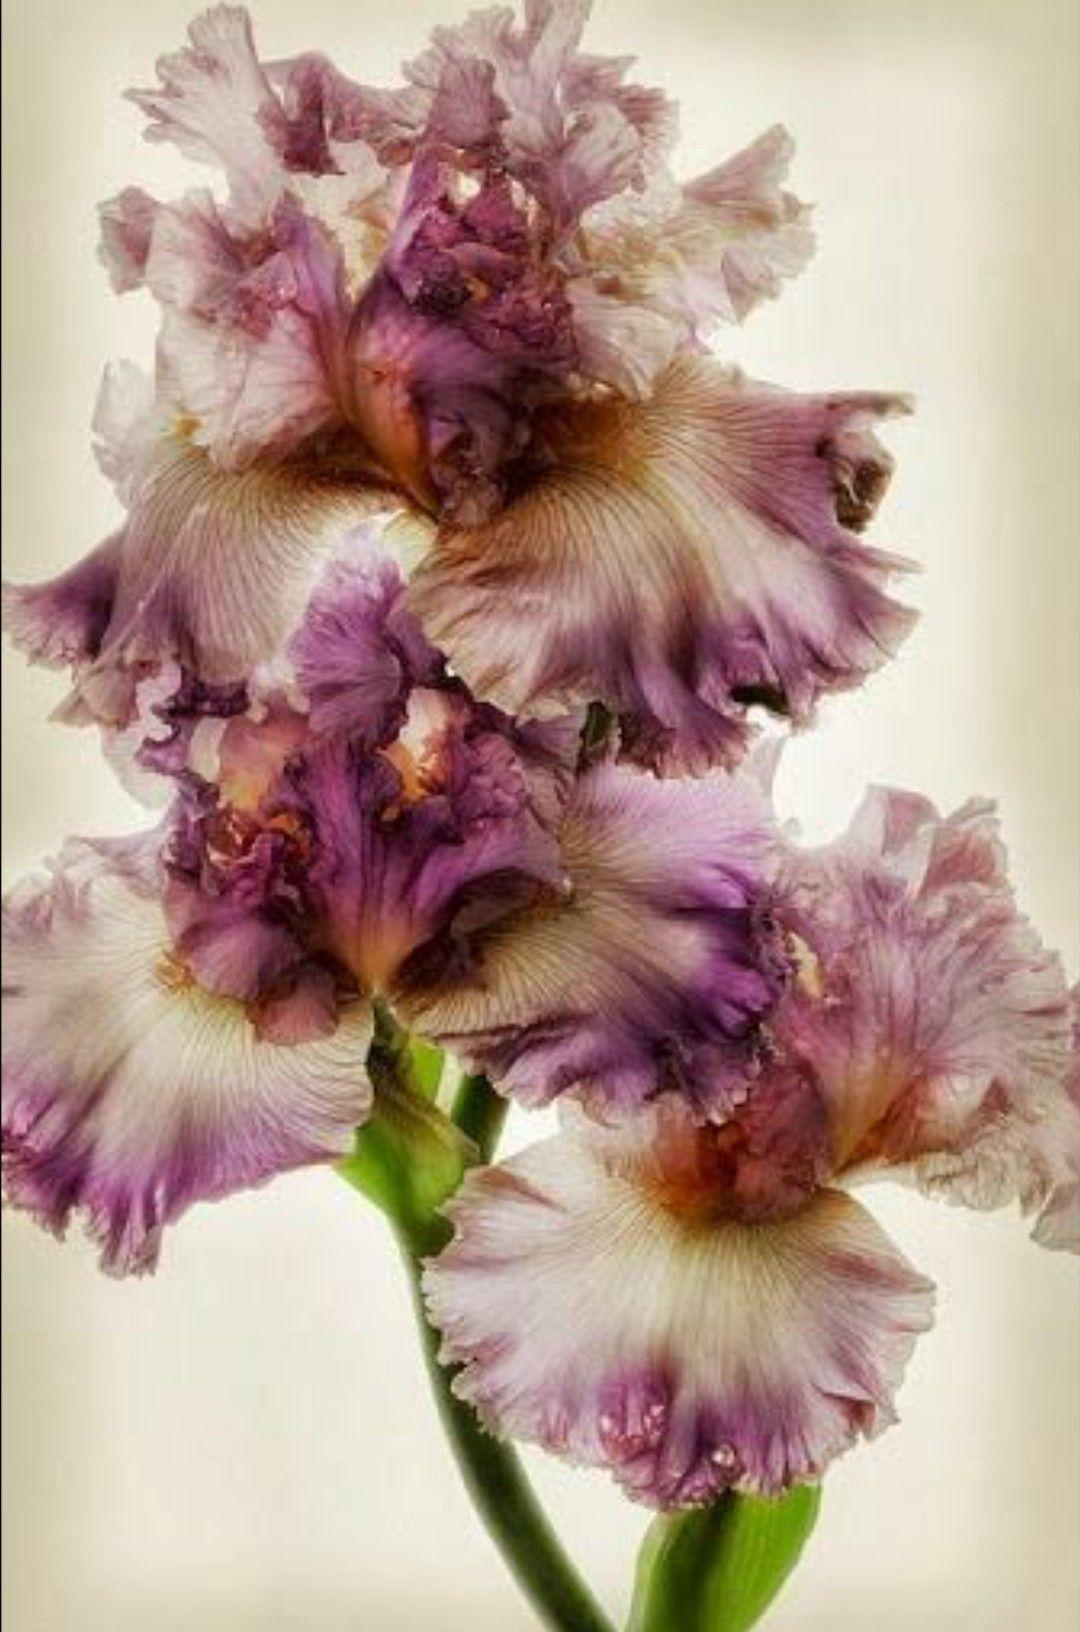 Frilly Iris Iris Flowers Pinterest Iris Flowers And Gardens